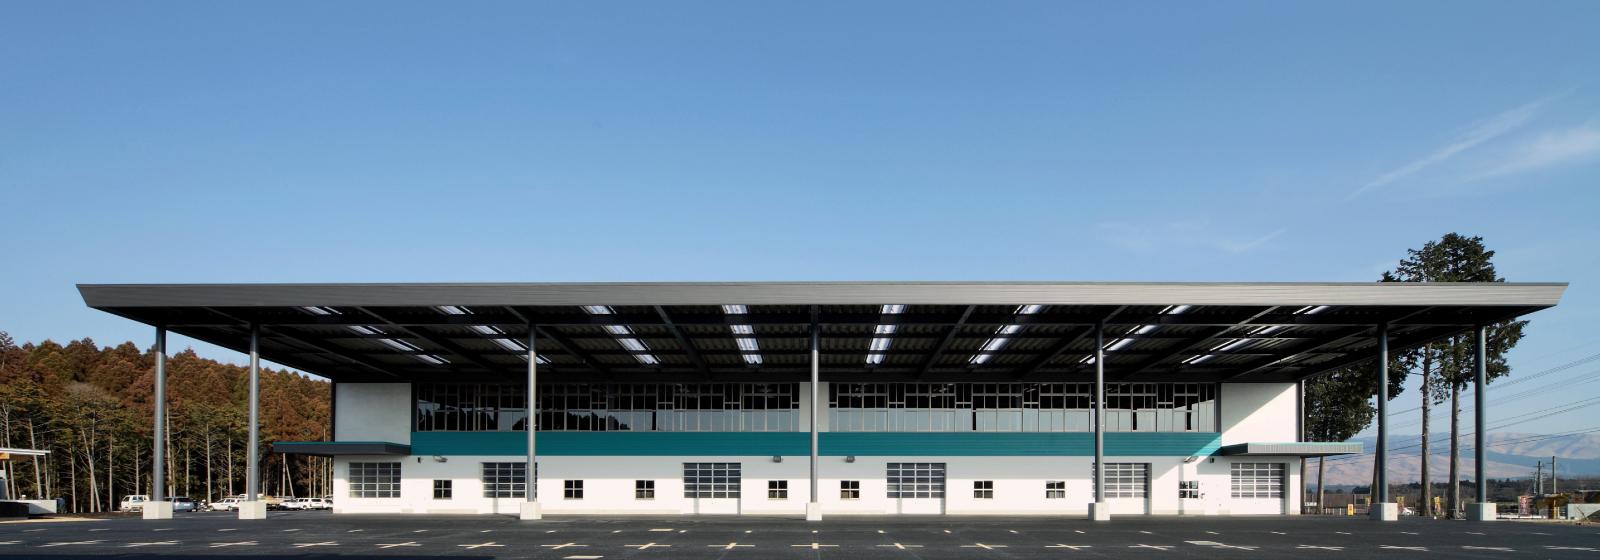 kubota_warehouse_photo5